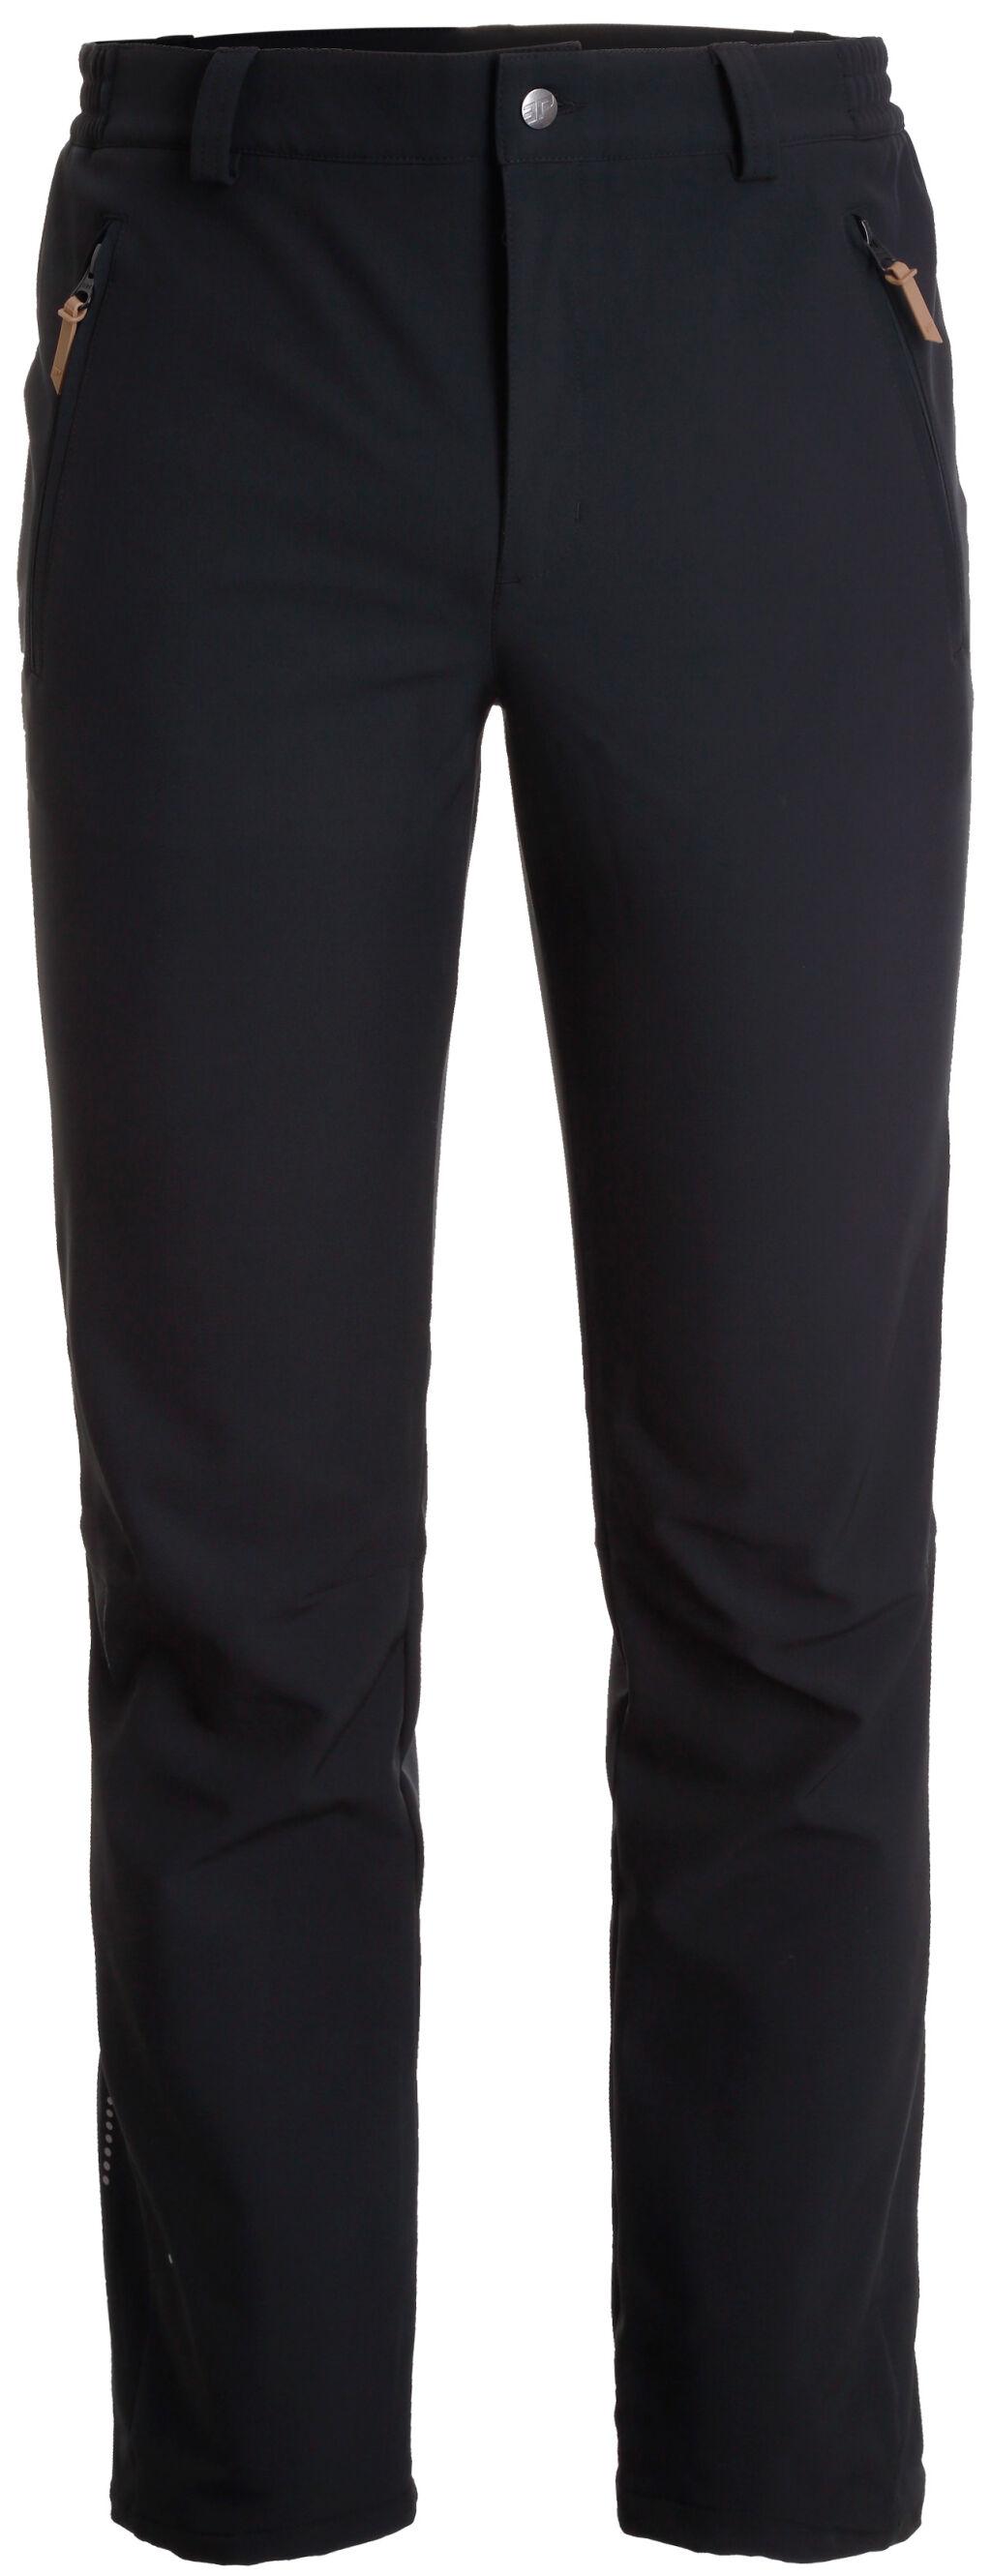 Icepeak Argo miesten softshell housut (musta)